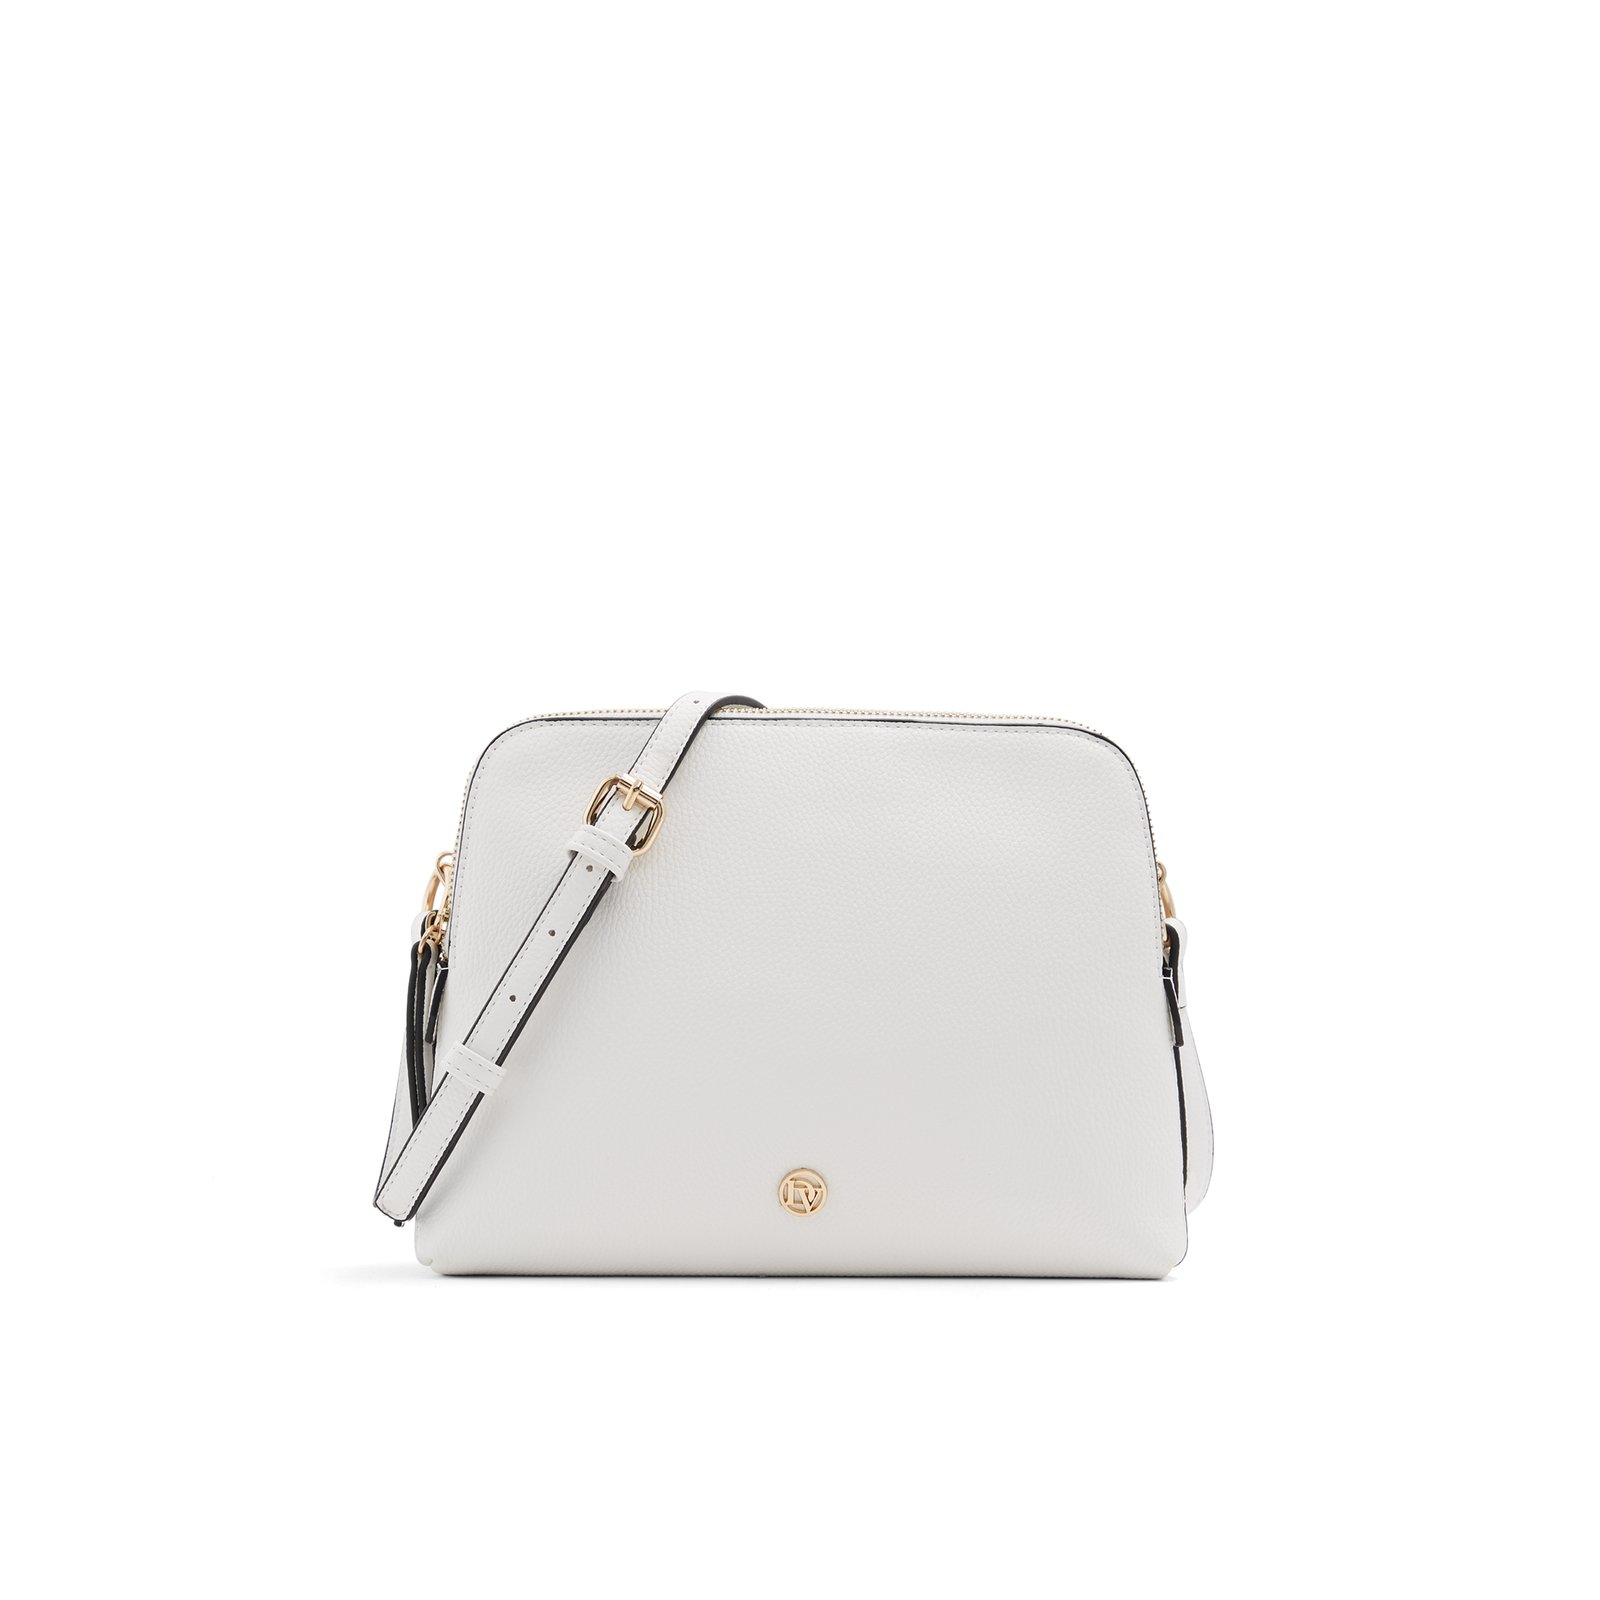 LA Diva Vardodia - Women's Handbags Crossbody & Messenger Bags - White photo